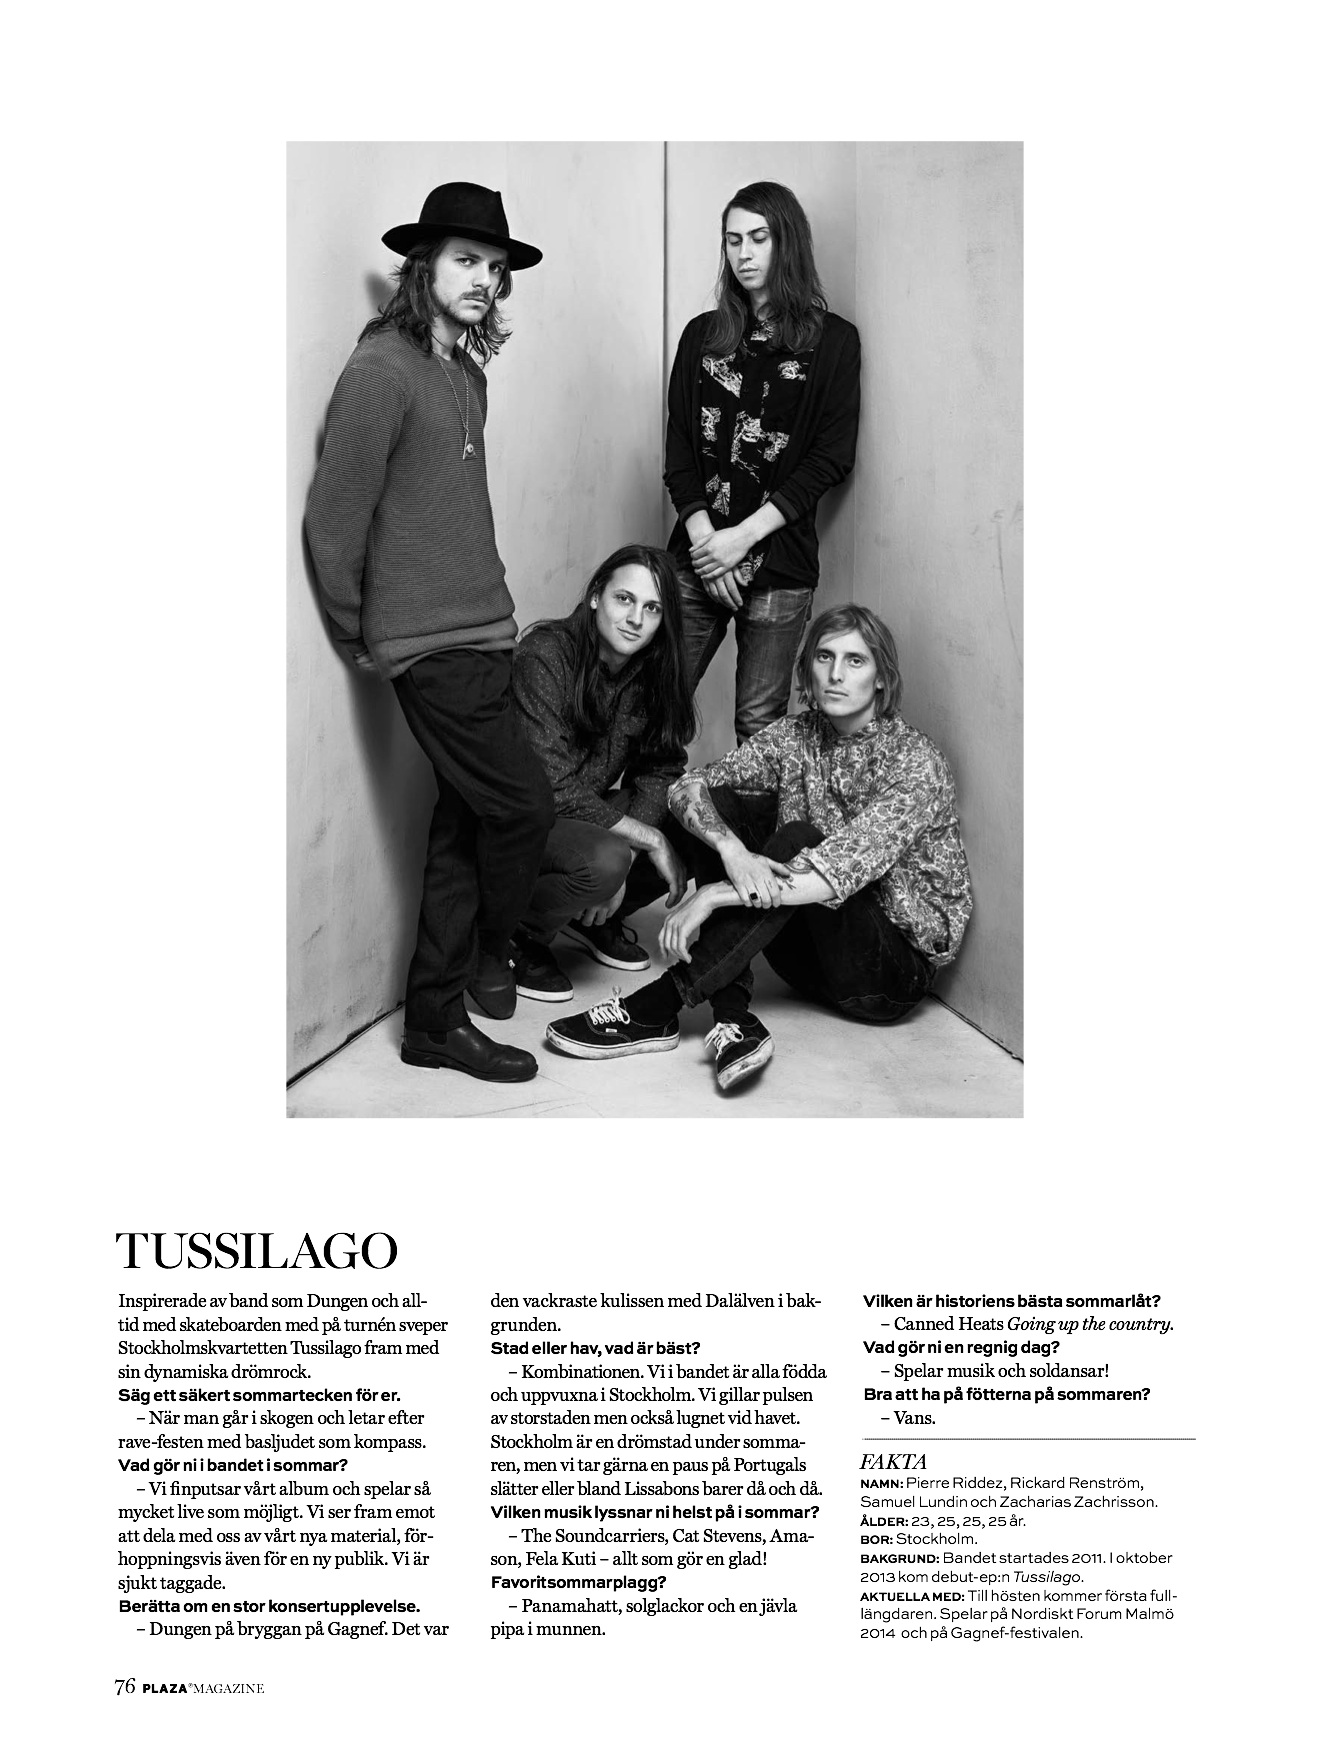 Plaza magazine - Tussilago.jpg